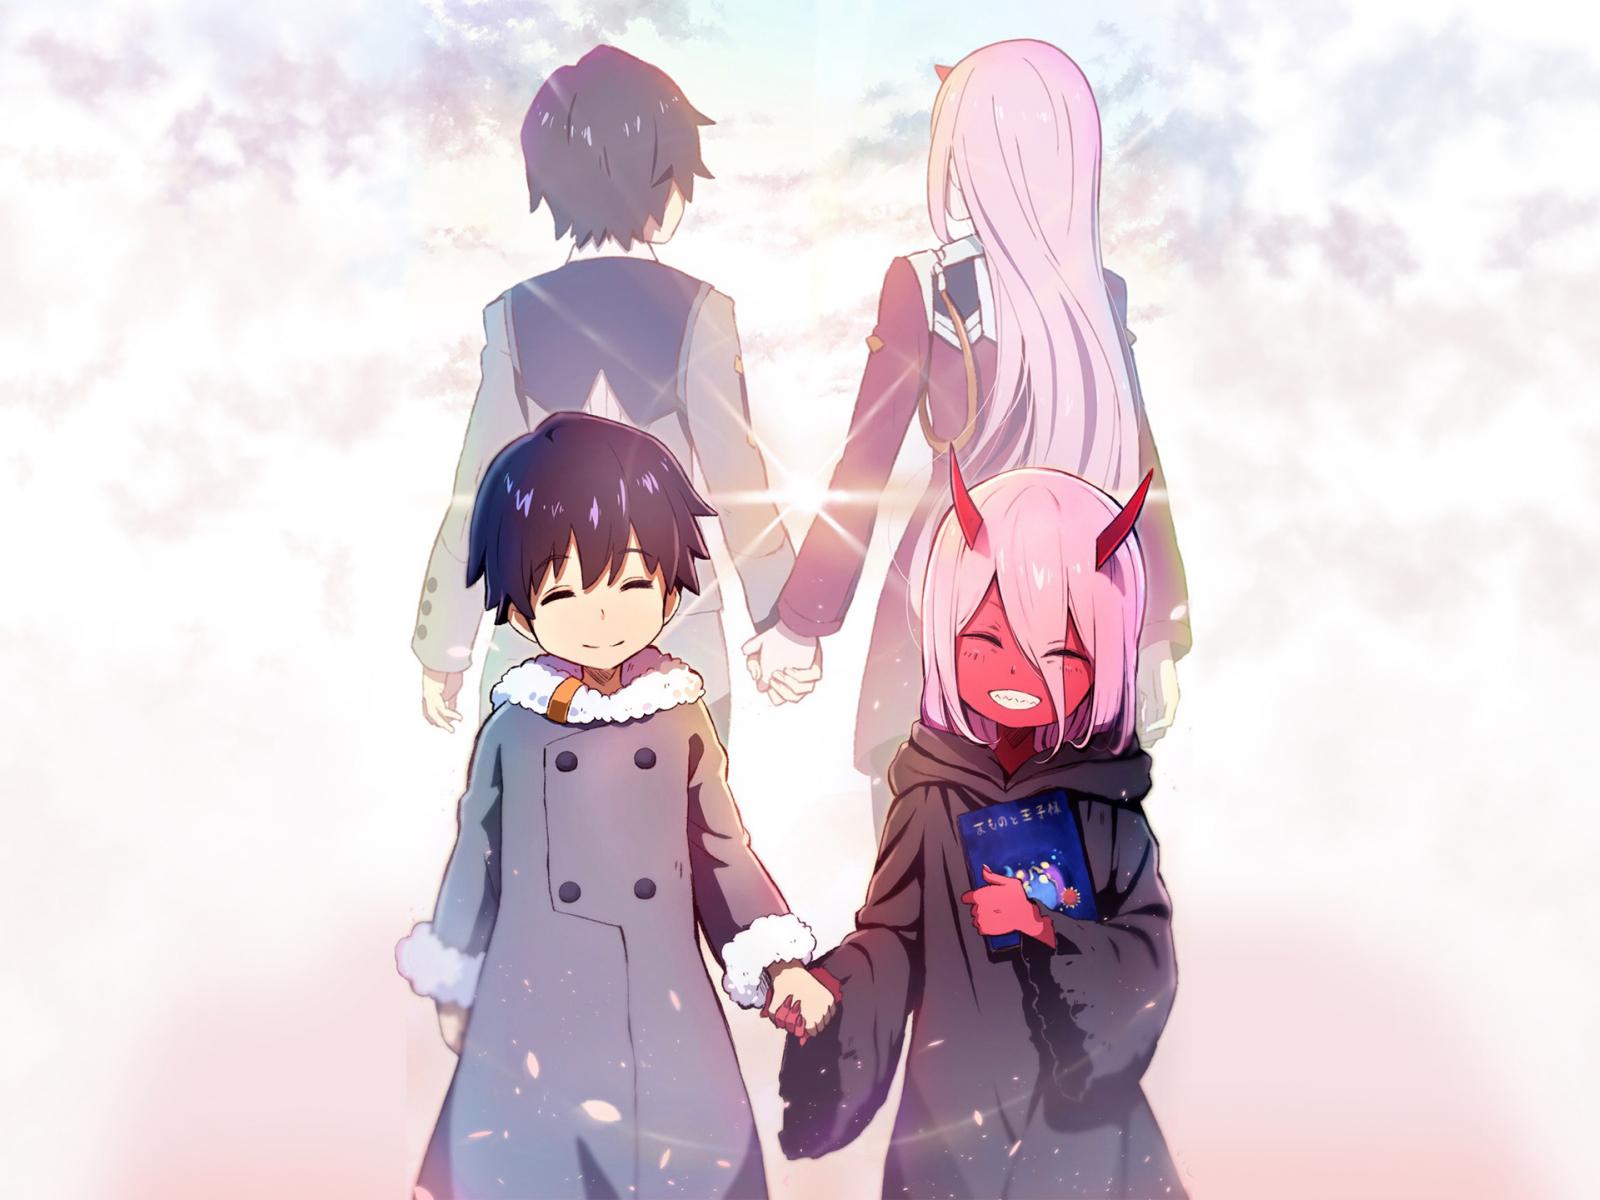 Download 1600x1200 wallpaper hiro and zero two anime - Anime 1600x1200 ...